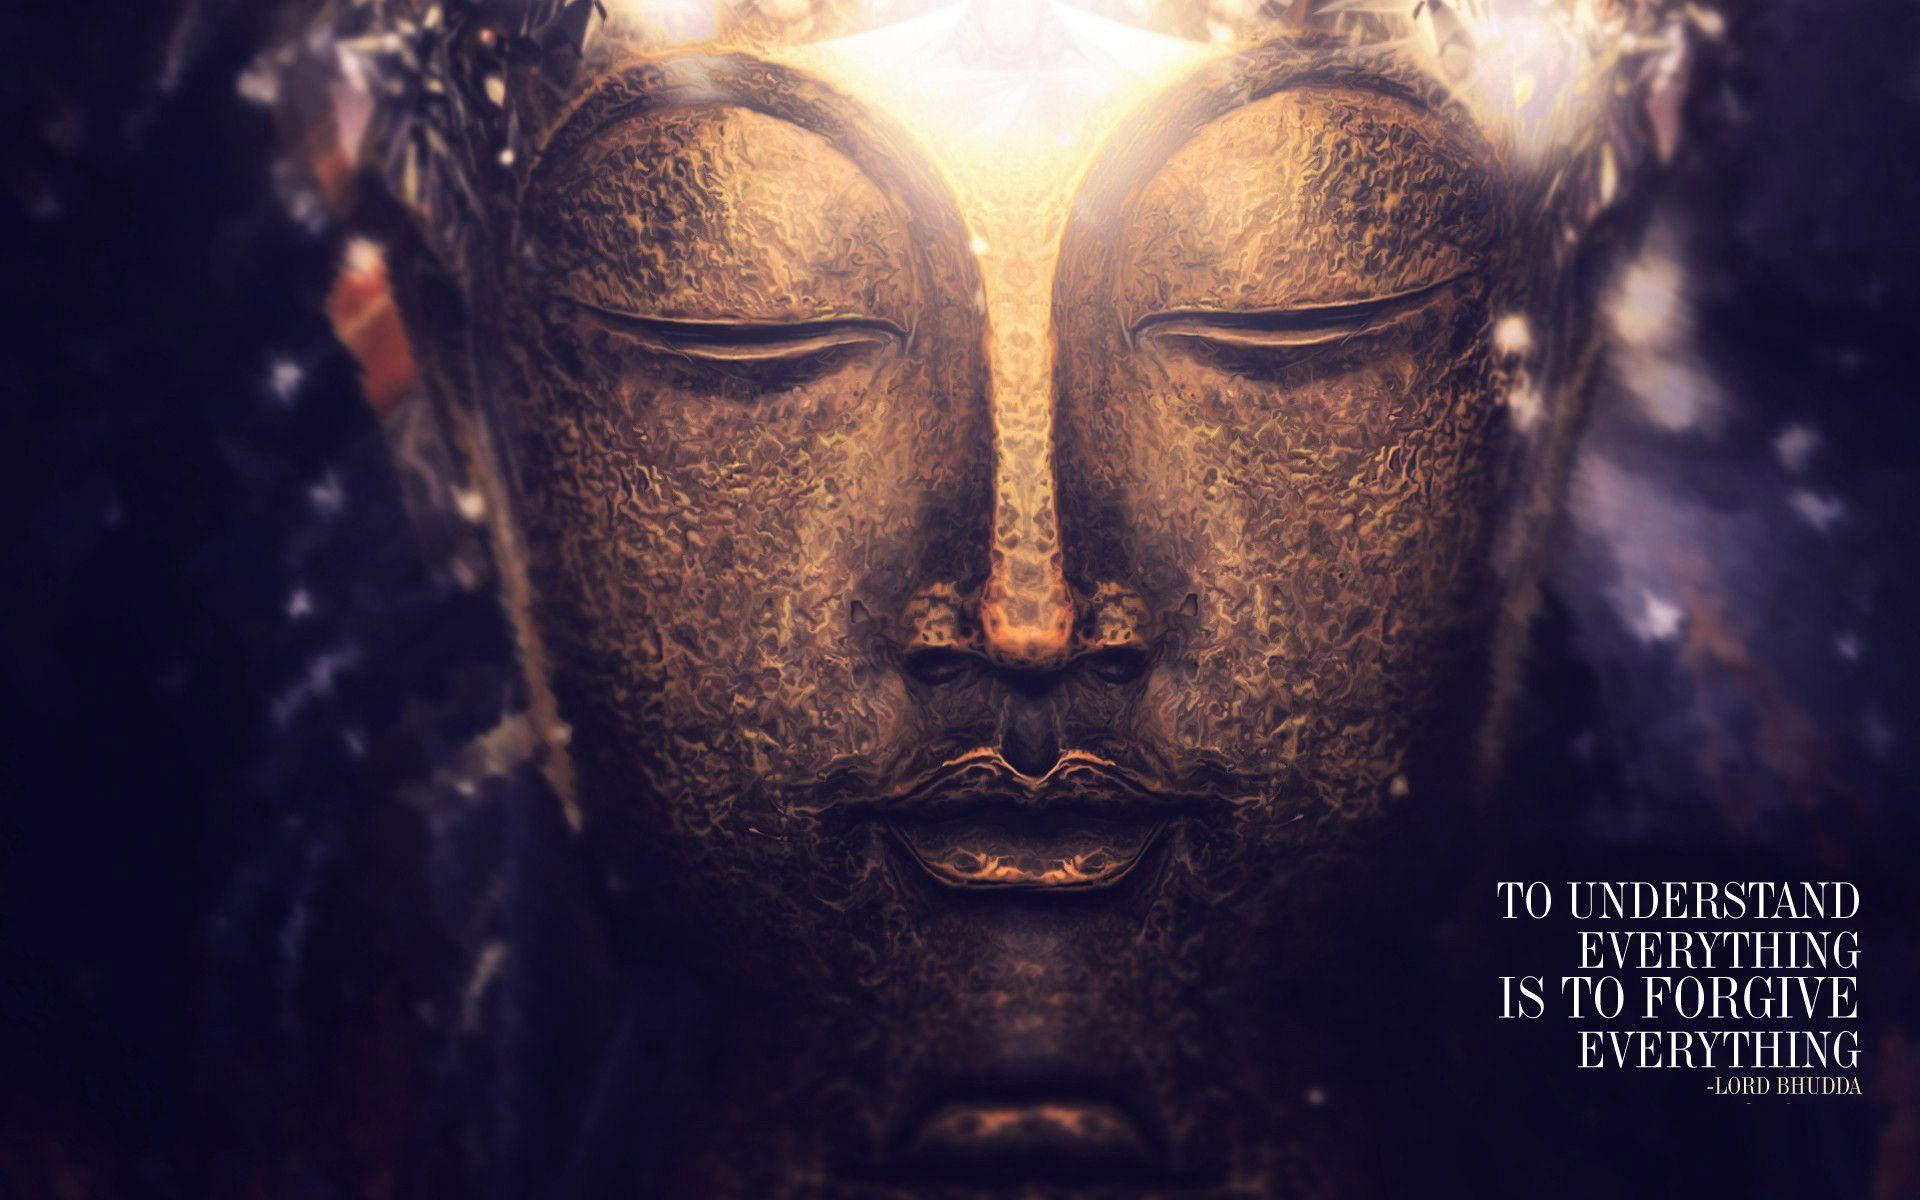 Lord Buddha Quotes HD Wallpaper